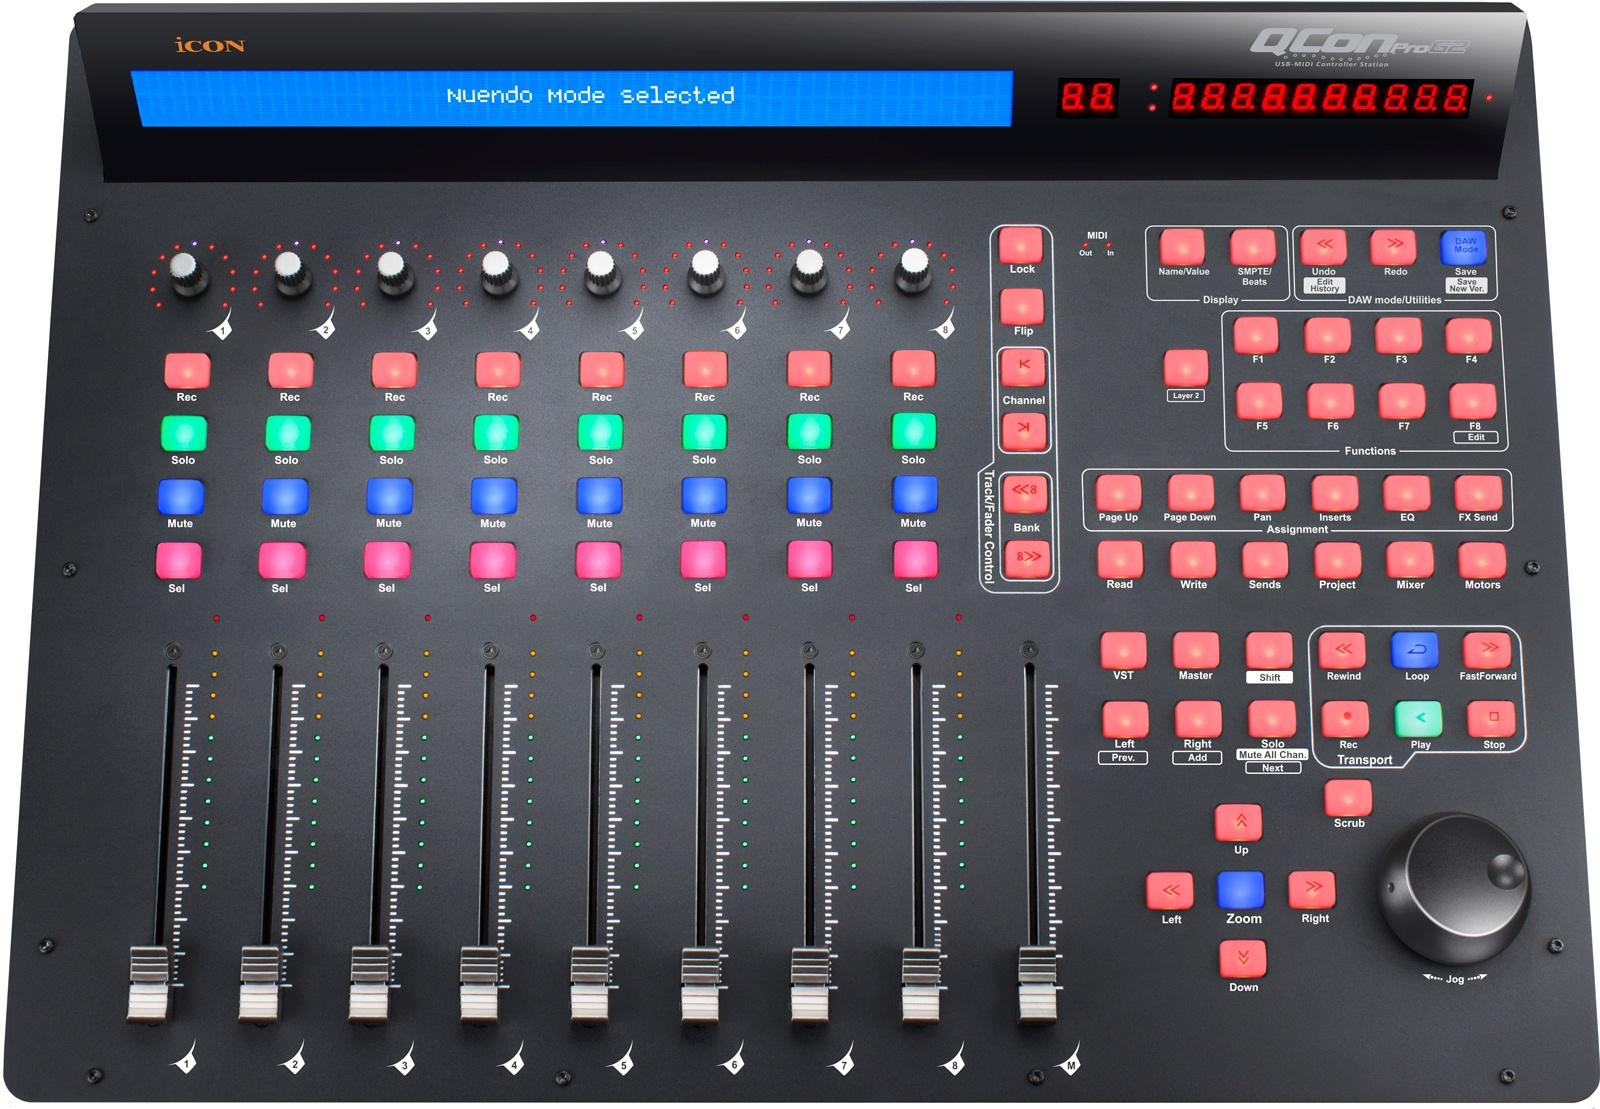 https://img.audiofanzine.com/images/u/product/normal/icon-qcon-pro-g2-236928.jpg